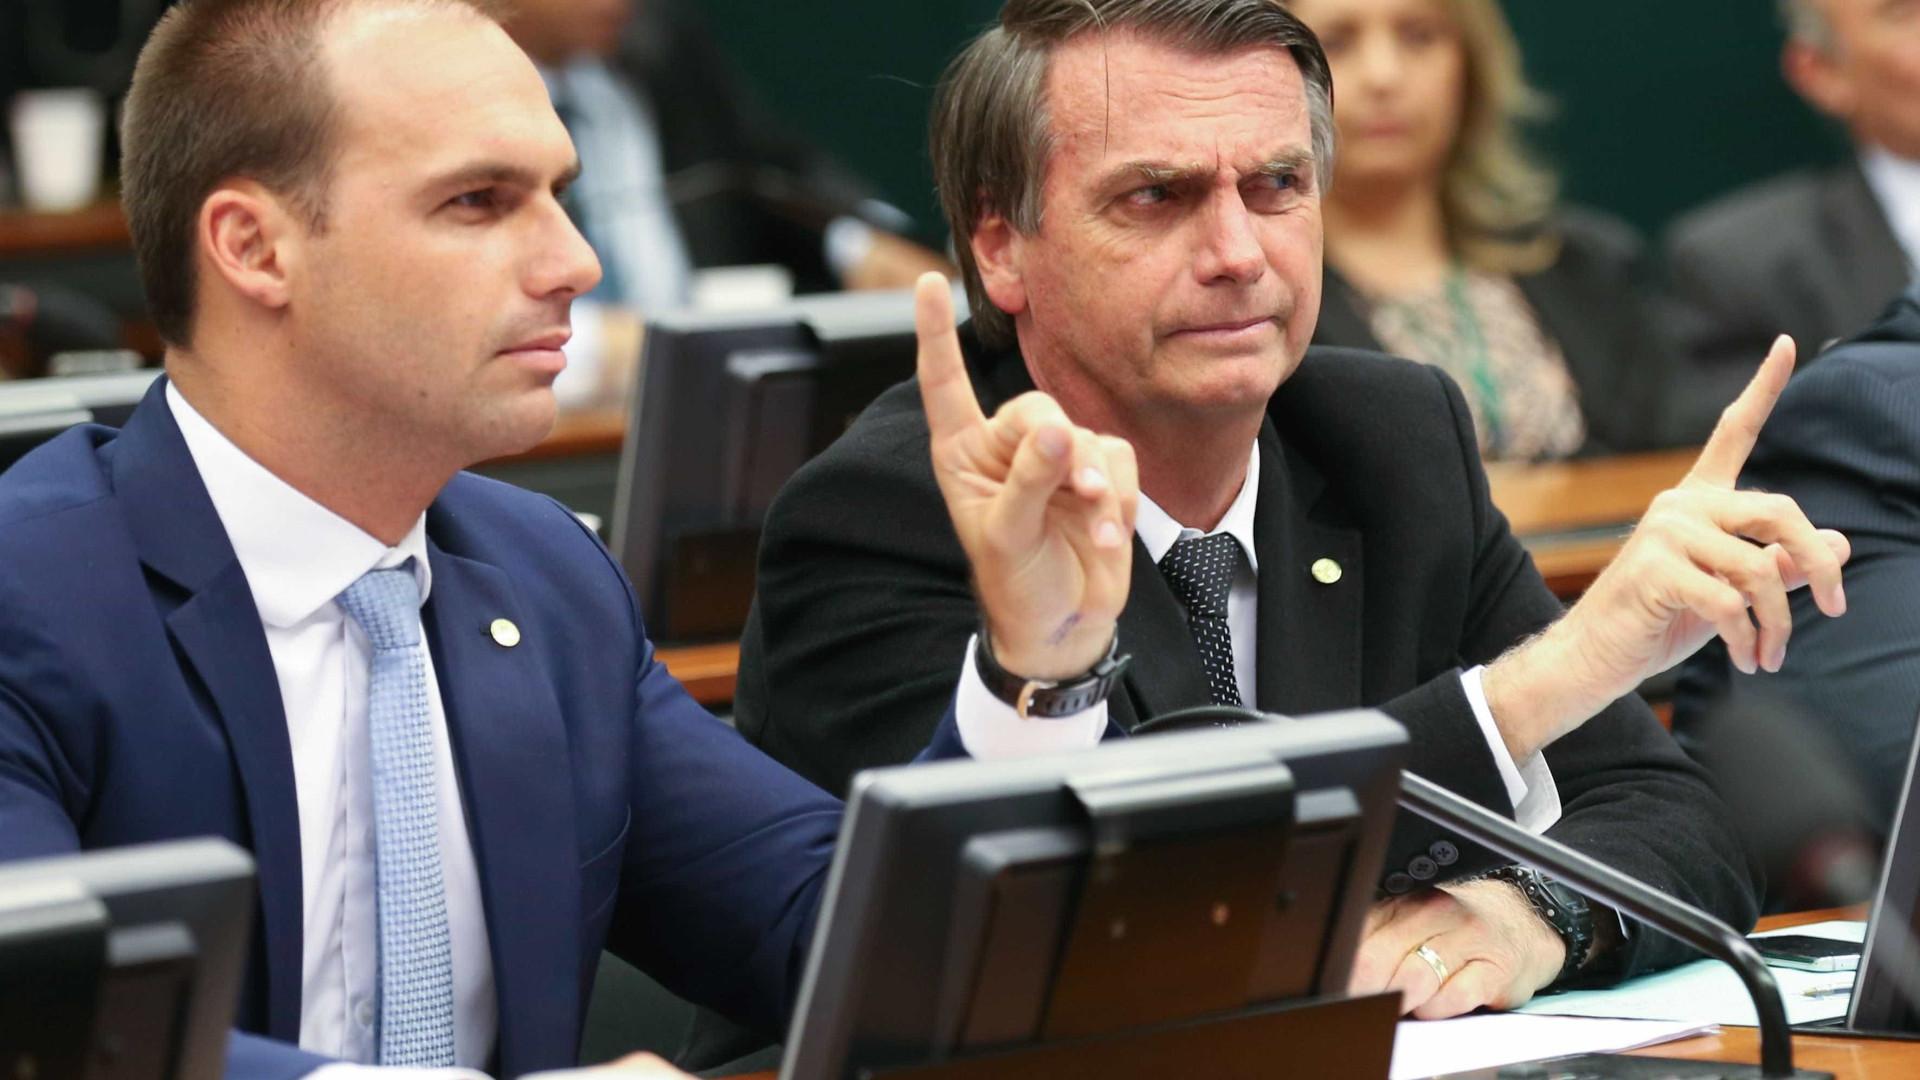 'Já adverti o garoto', diz Bolsonaro sobre filho falar em fechar STF